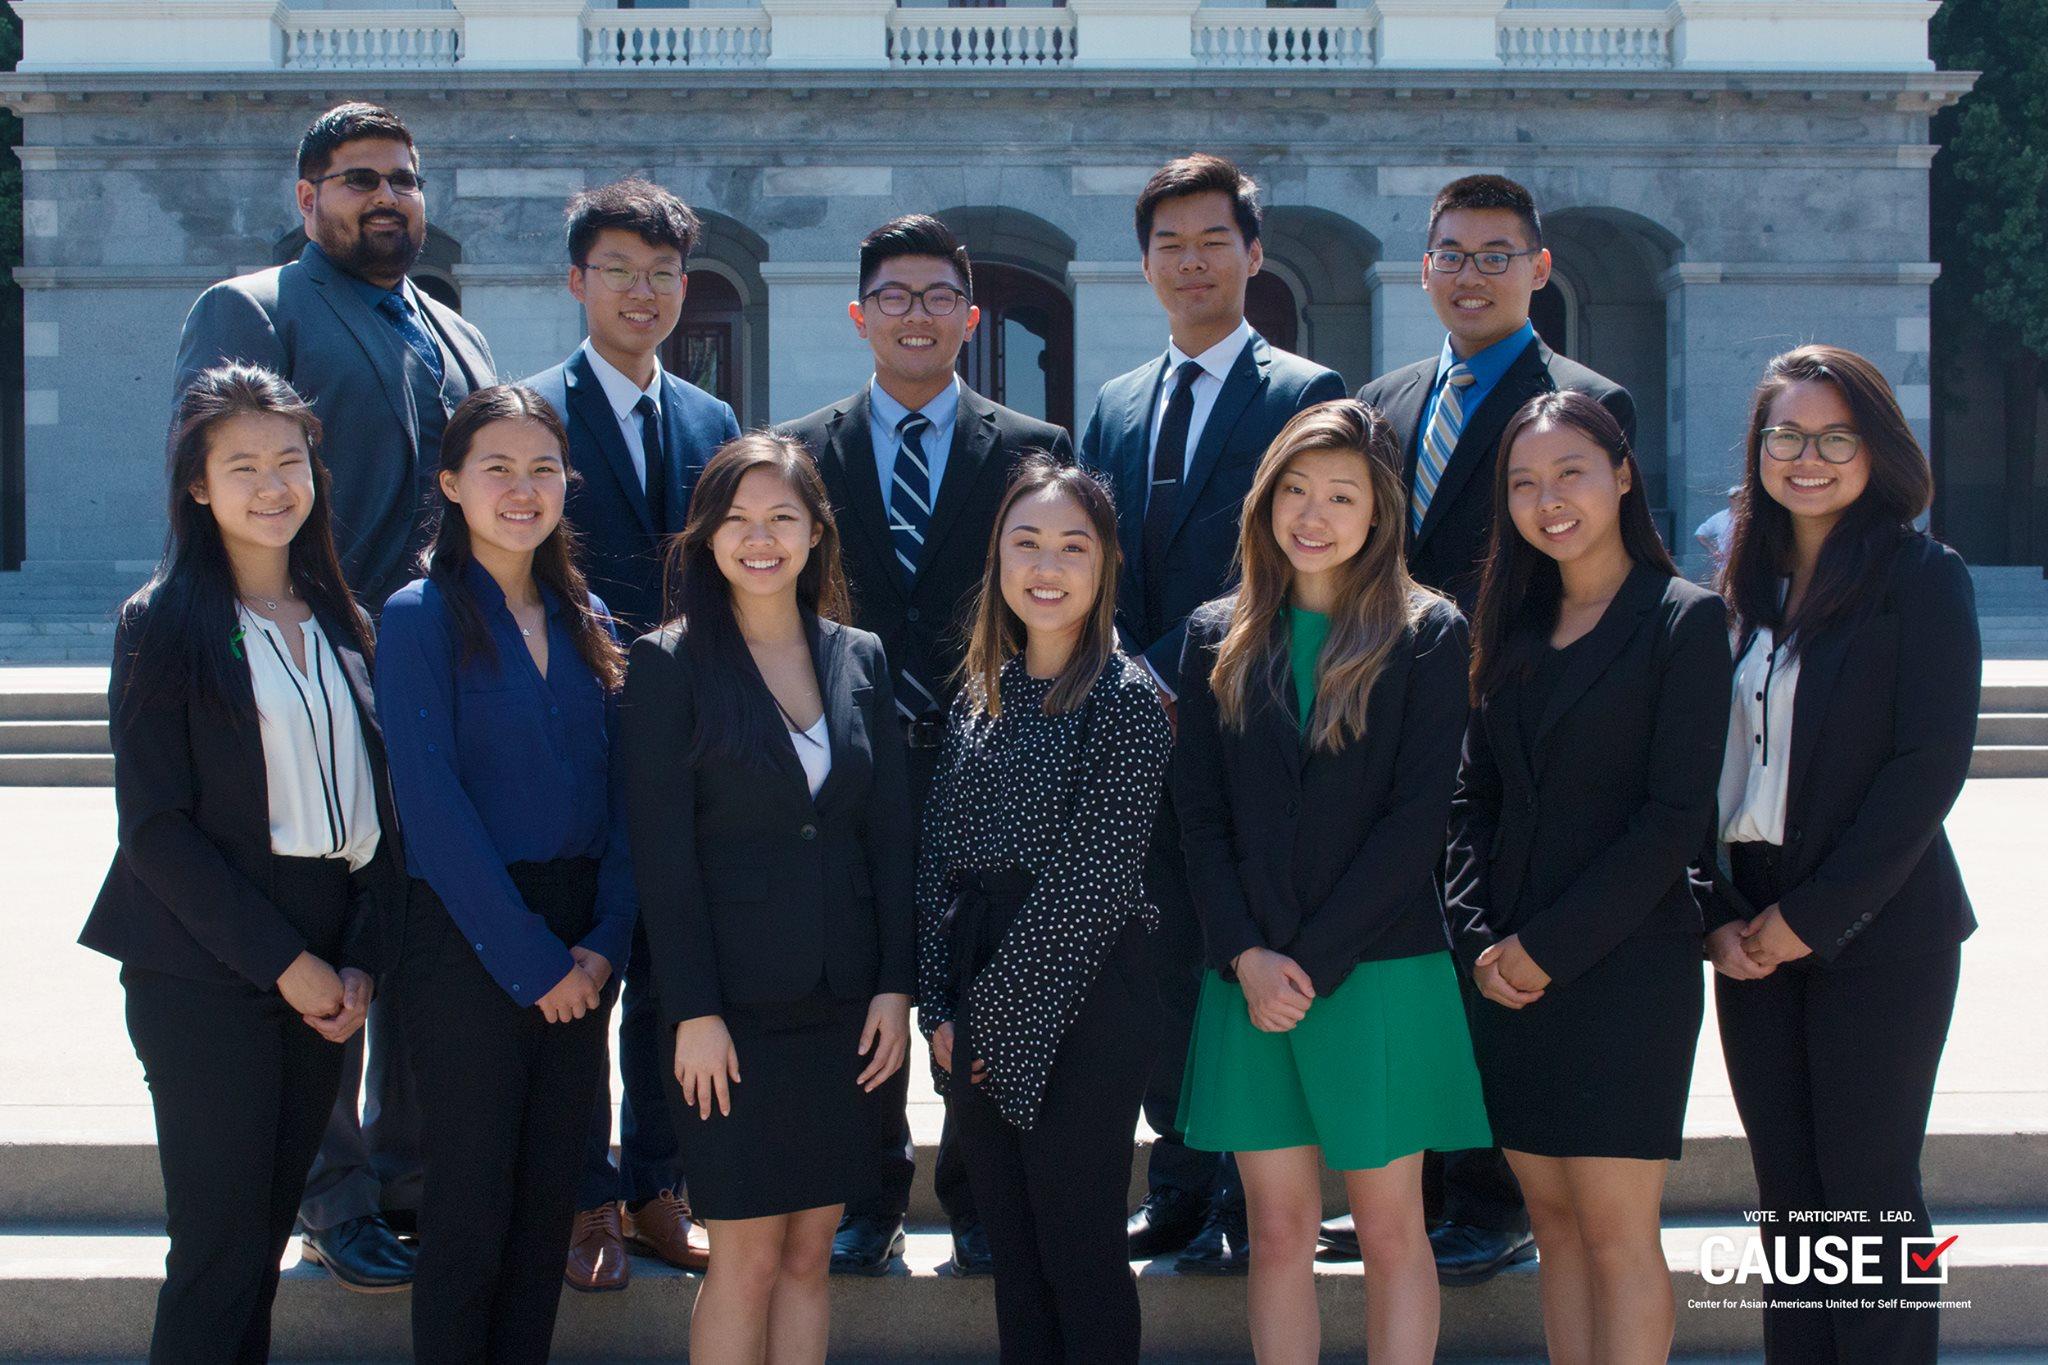 2018 CAUSE Leadership Academy interns